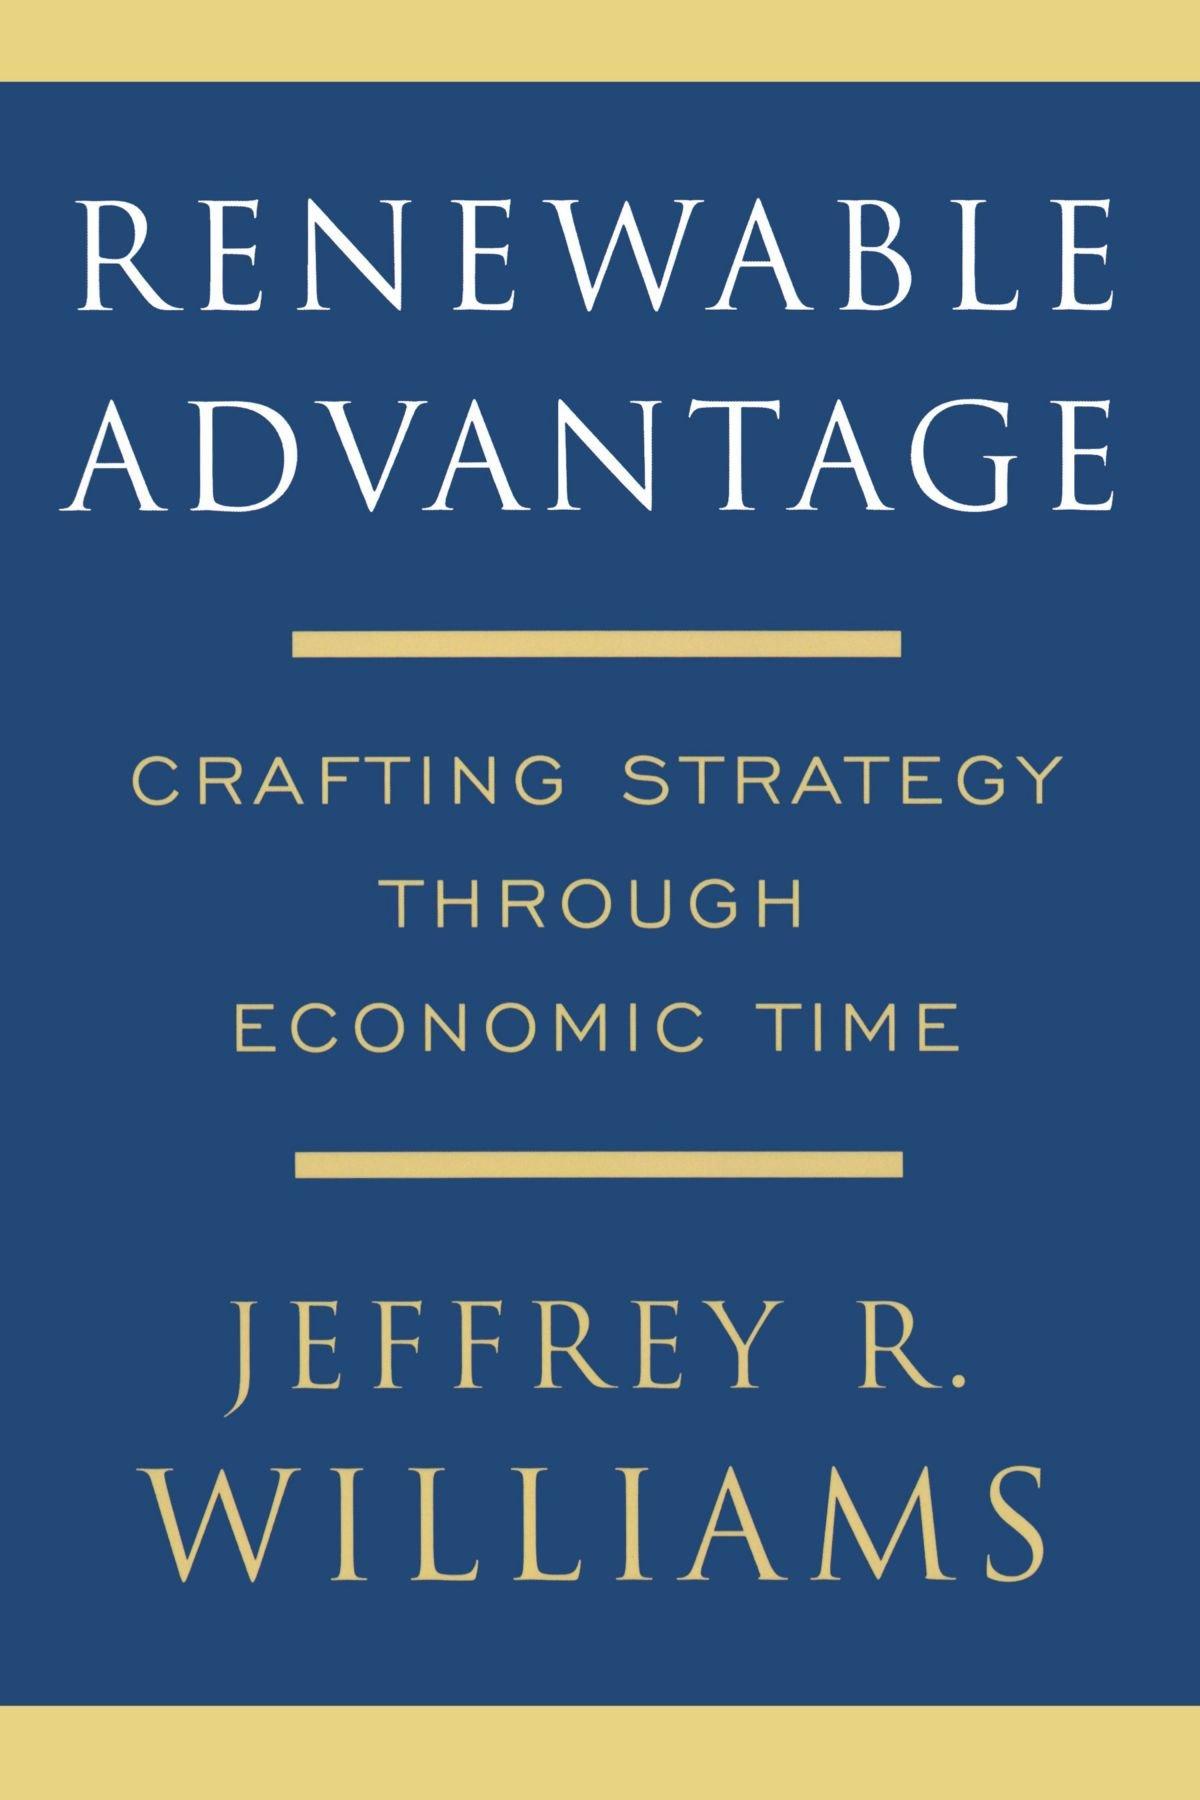 Renewable Advantage: Crafting Strategy Through Economic Time ...